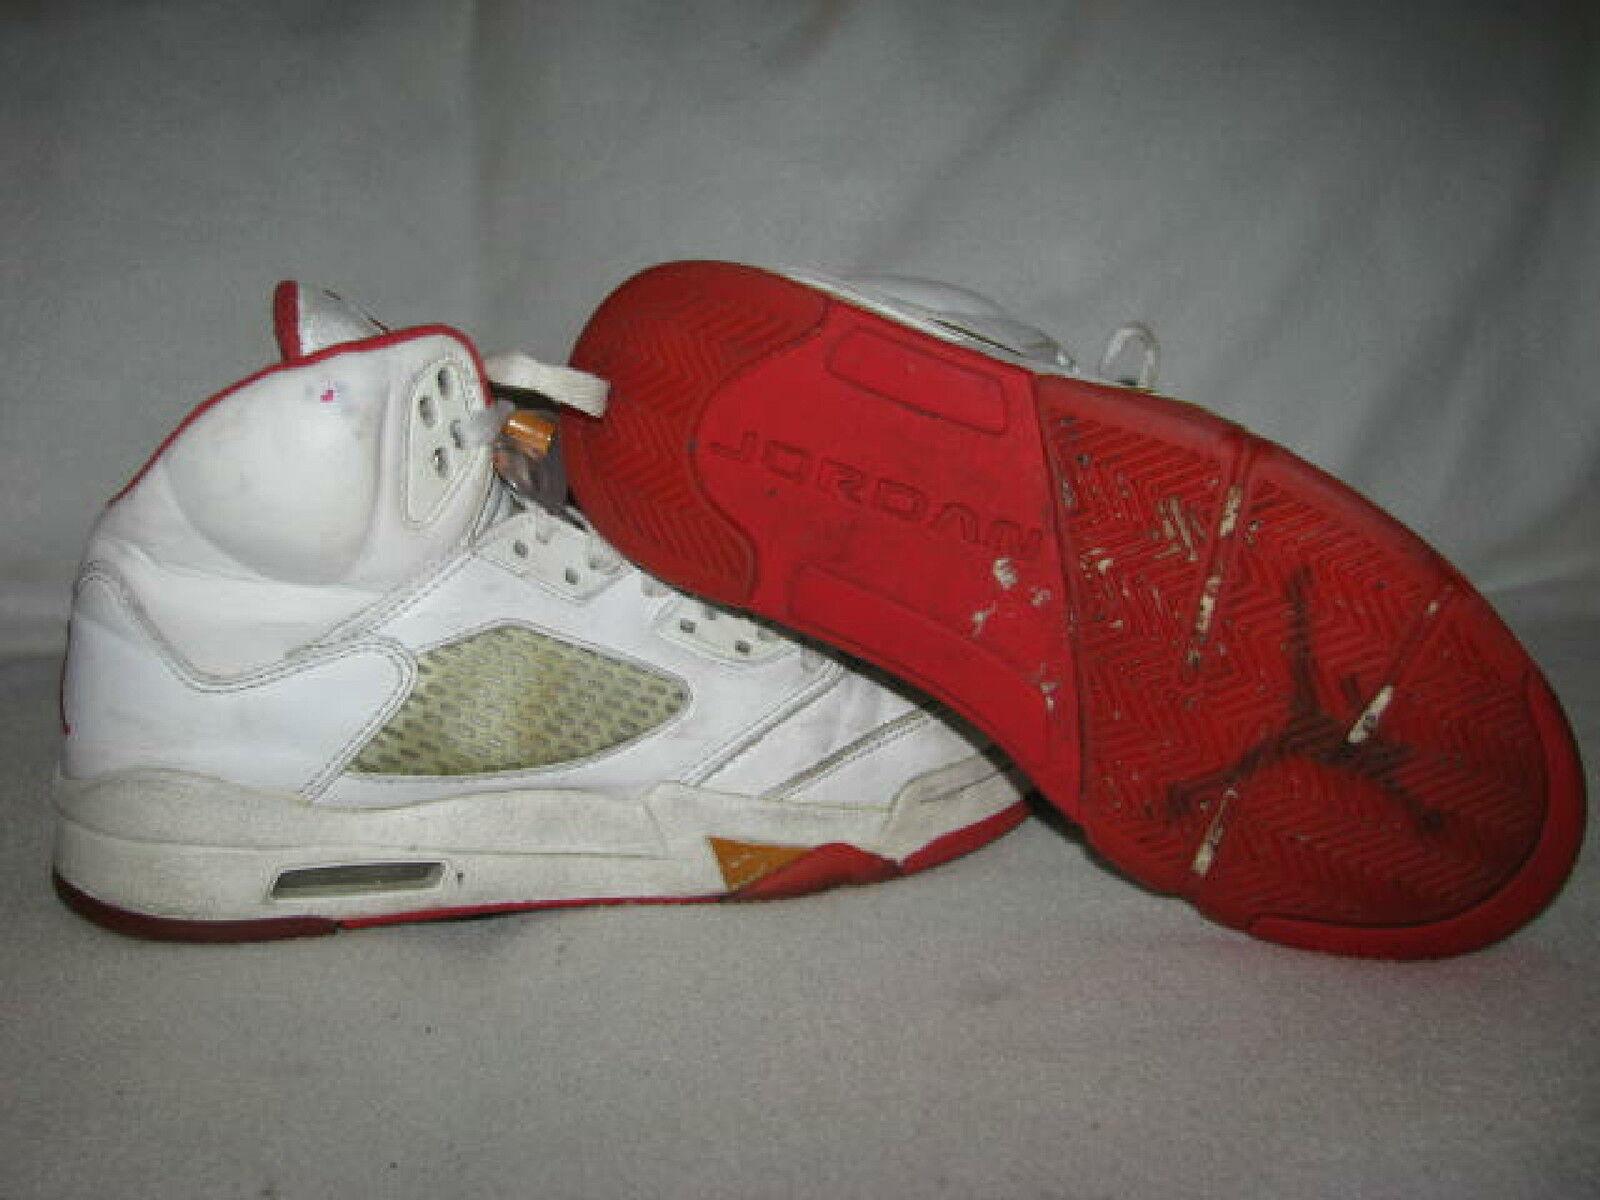 2006 Nike Air JORDAN 5 V Fire Red Womens Sz 7.5 38.5  313551-161